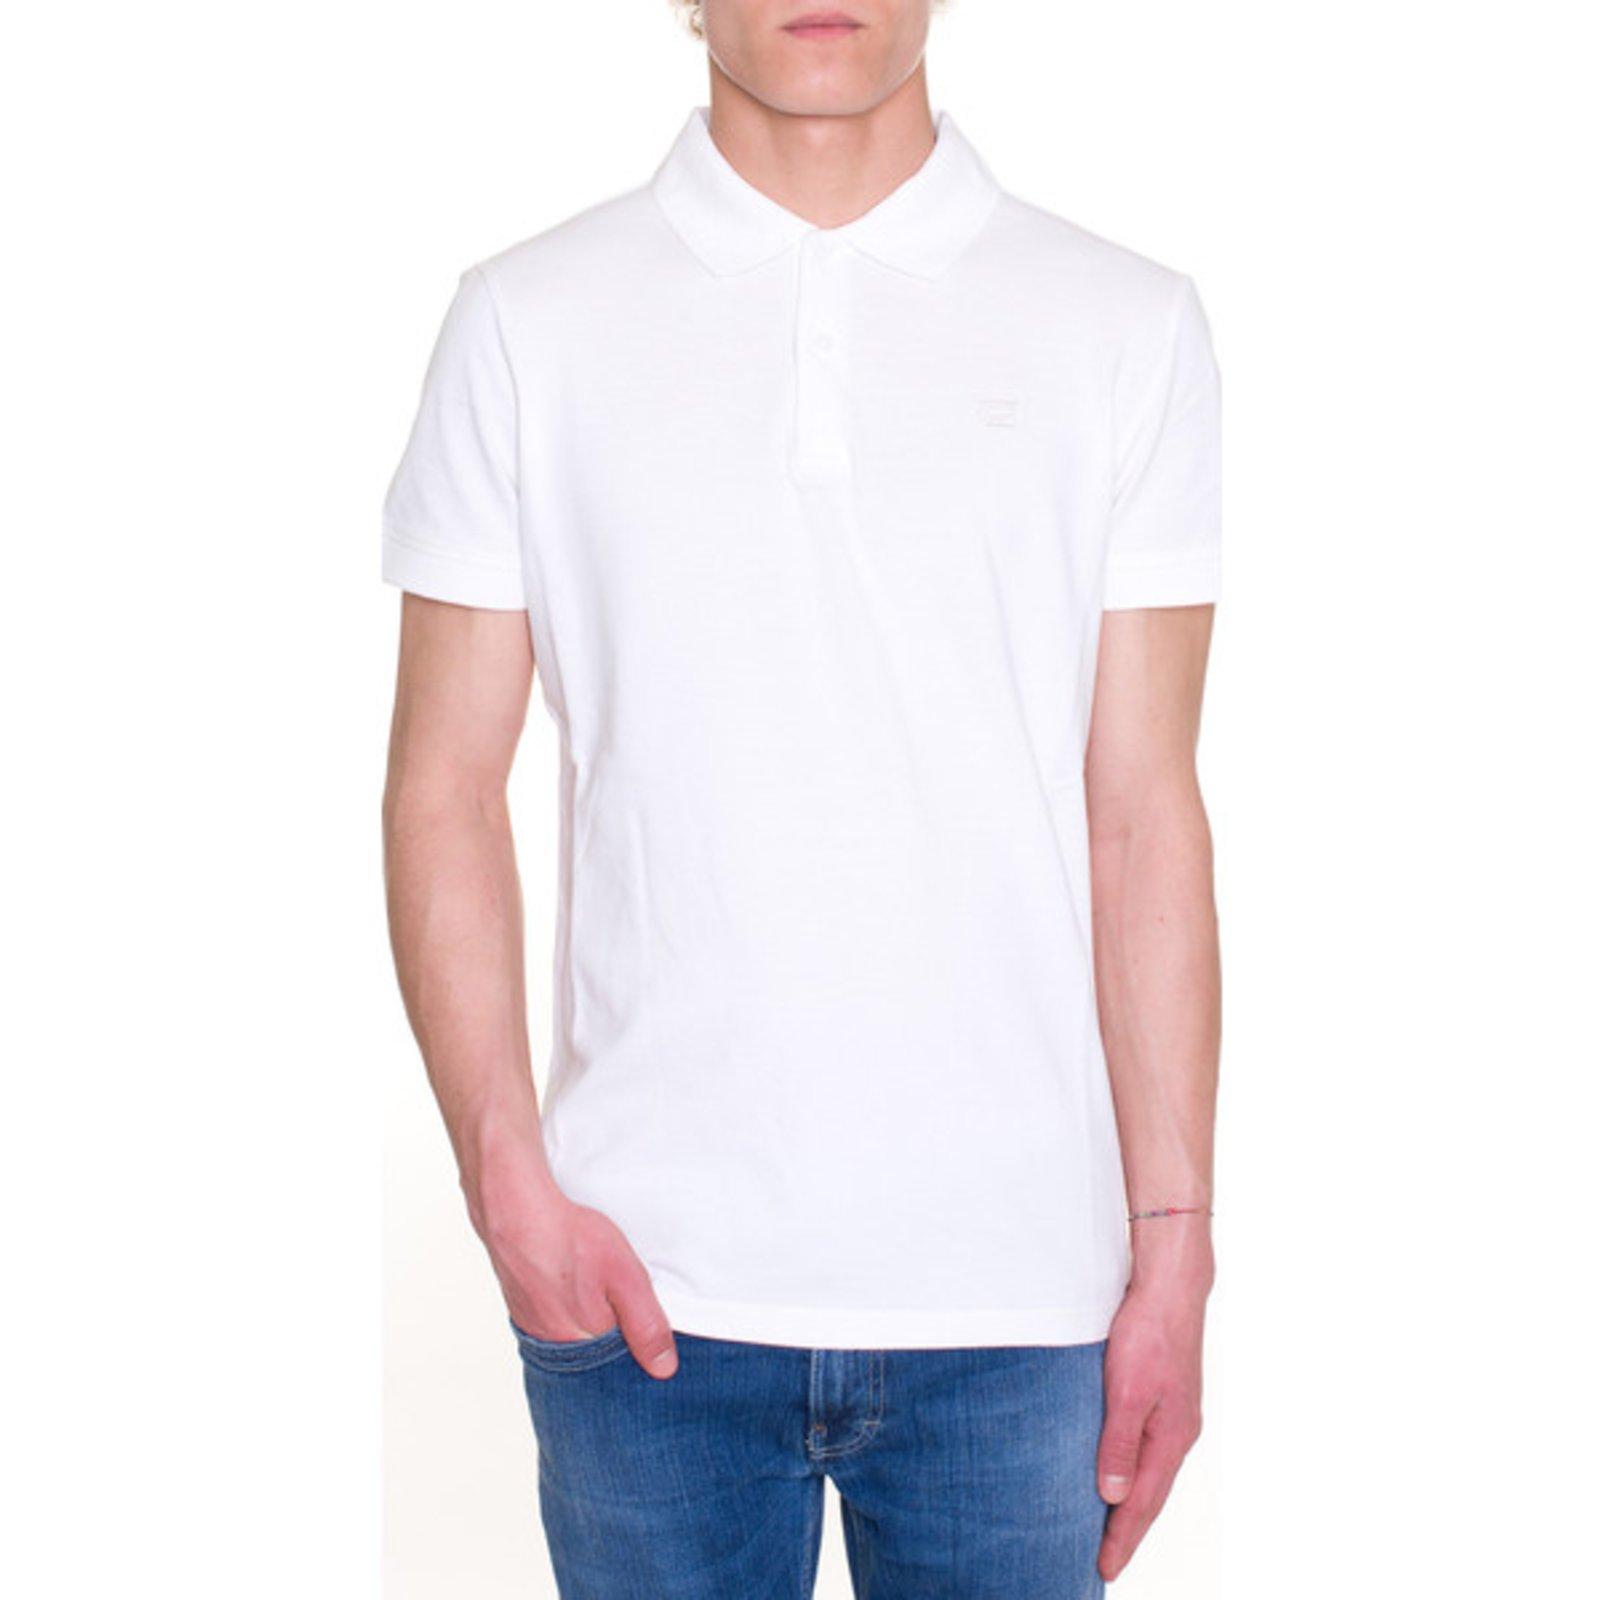 outlet store 53c8e 4b59e Class roberto cavalli new polo shirt white